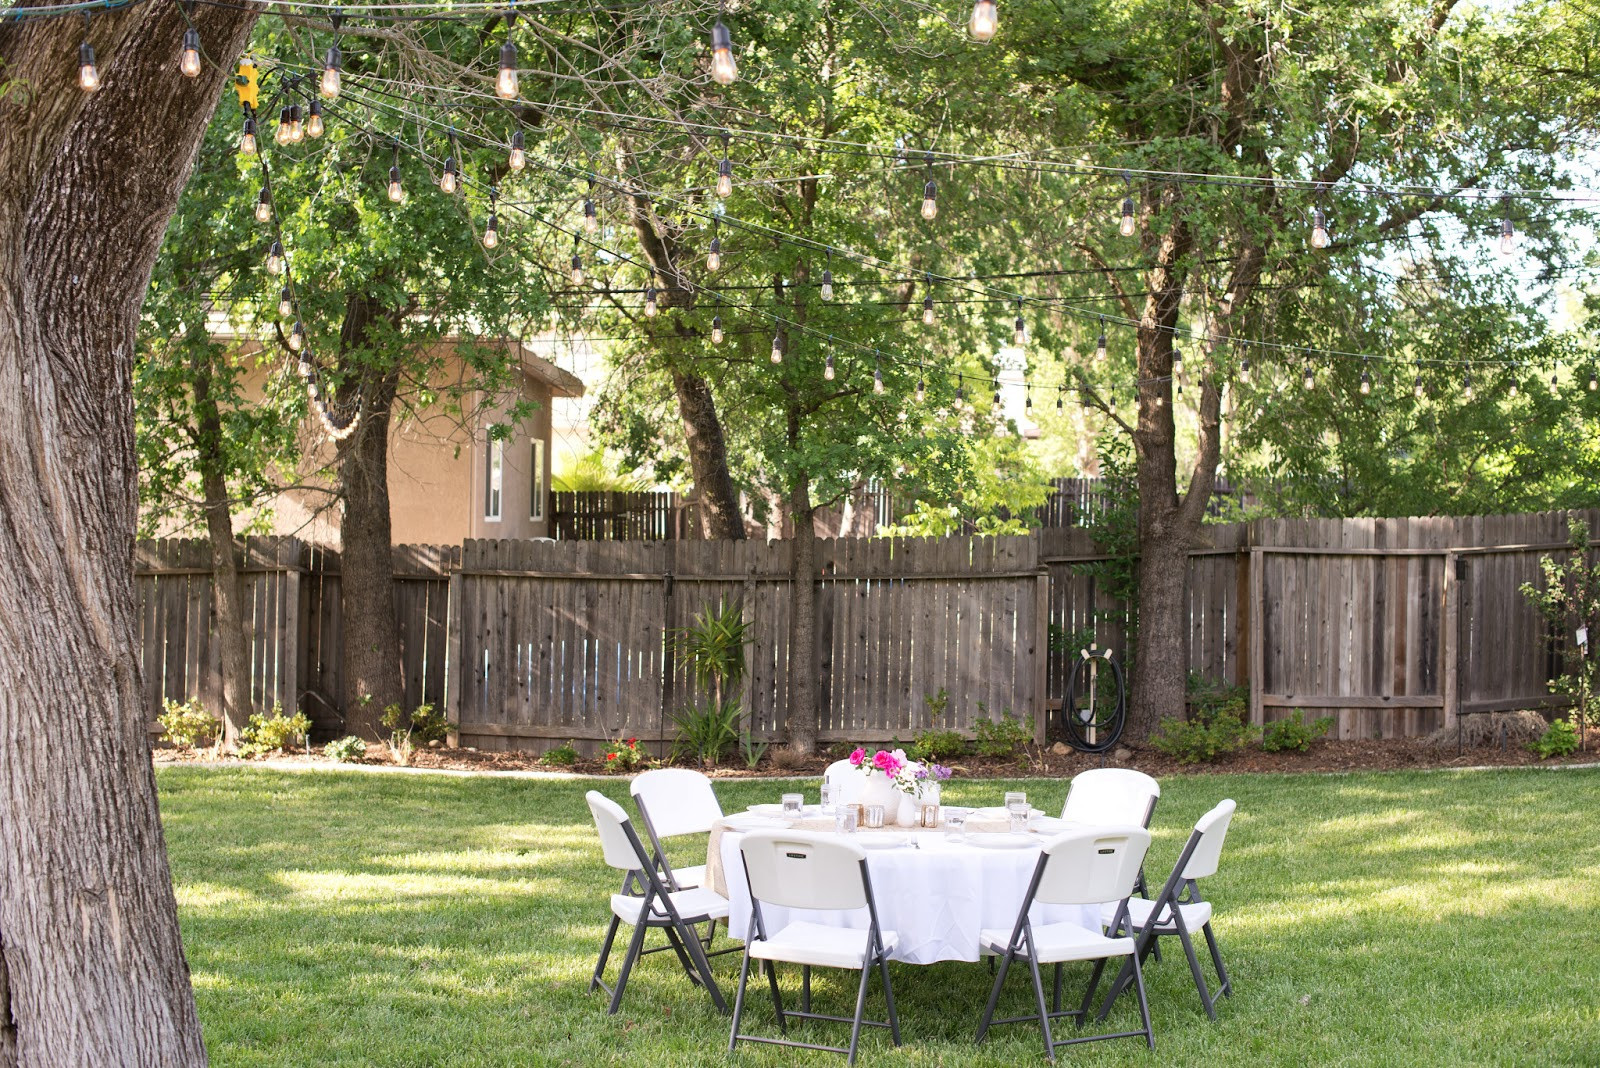 Backyard Dinner Party Ideas  Domestic Fashionista Backyard Anniversary Dinner Party